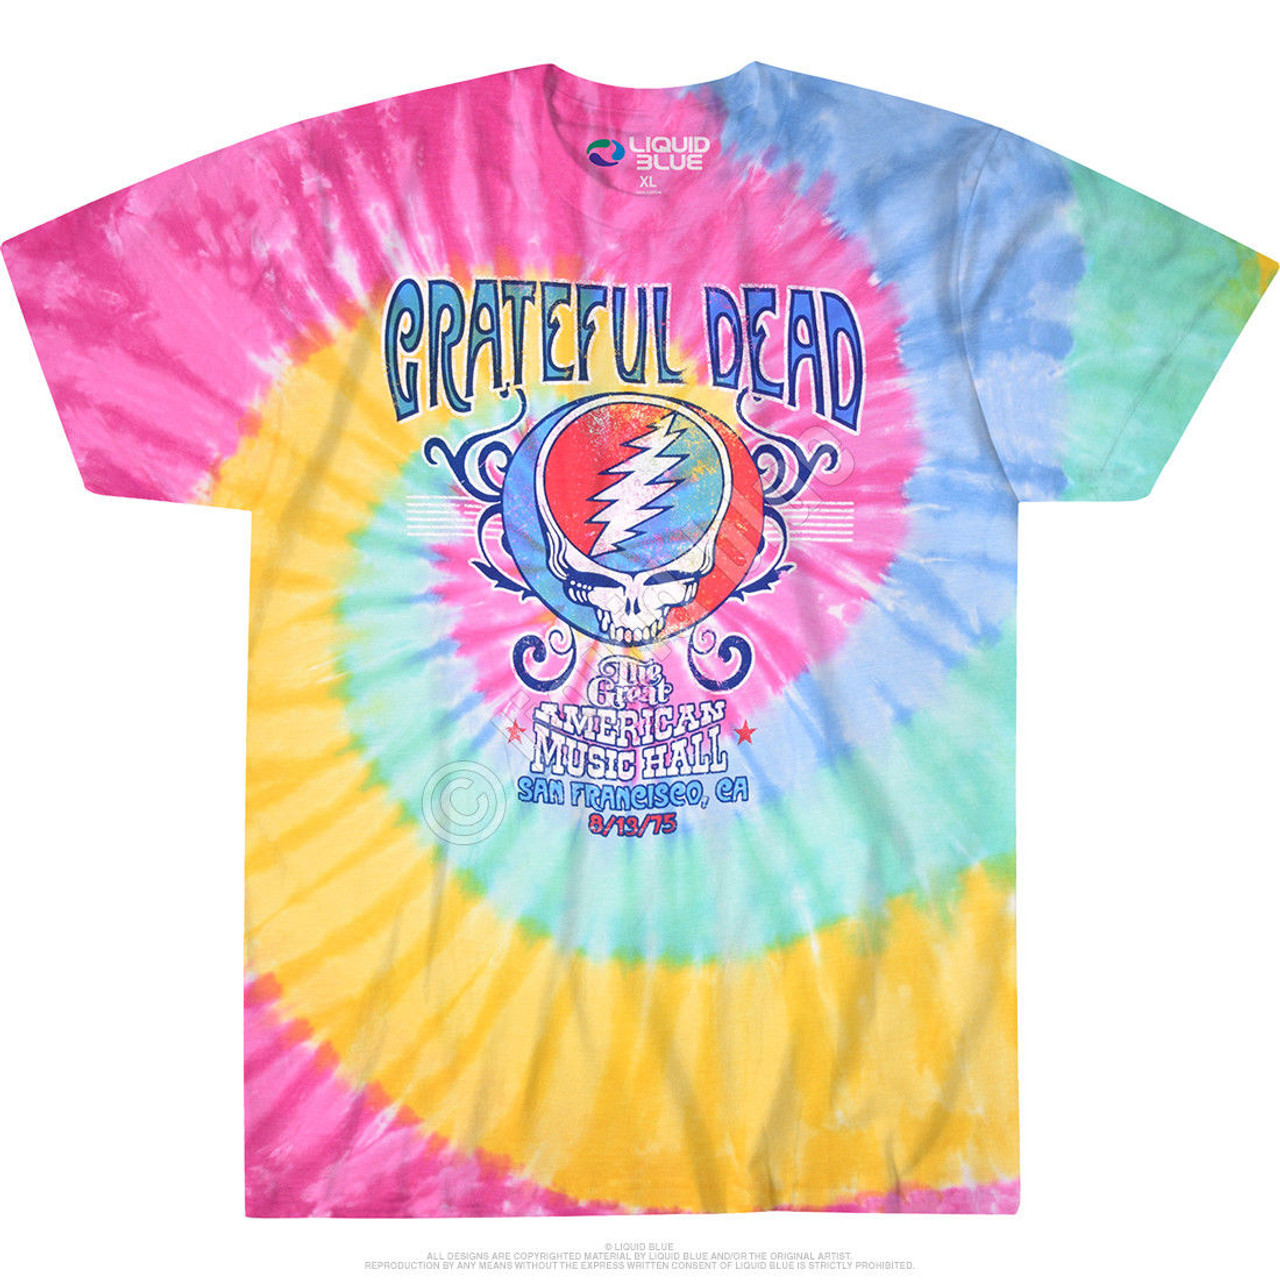 New GRATEFUL DEAD Midnight HOUR TIE DYE T Shirt 2 SIDED LICENSED ROCK SHIRT